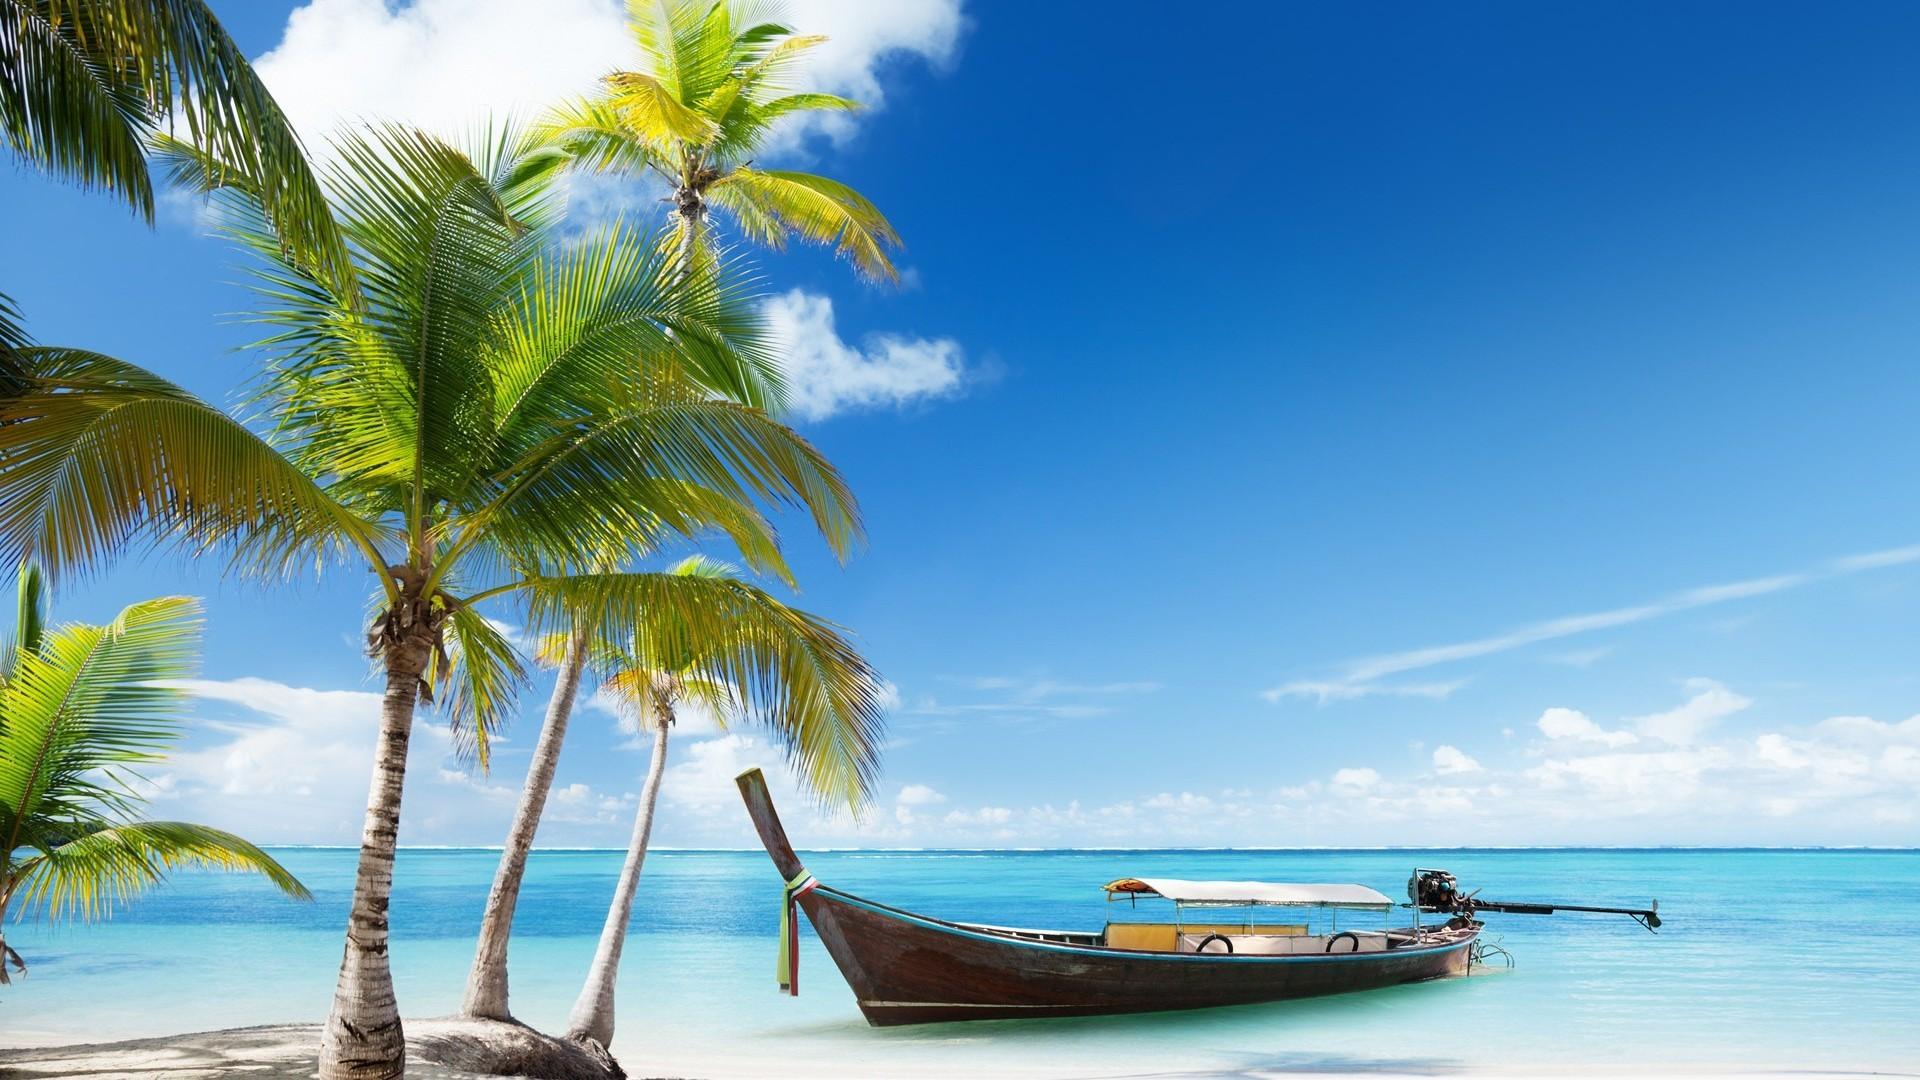 Island HD Desktop Wallpaper